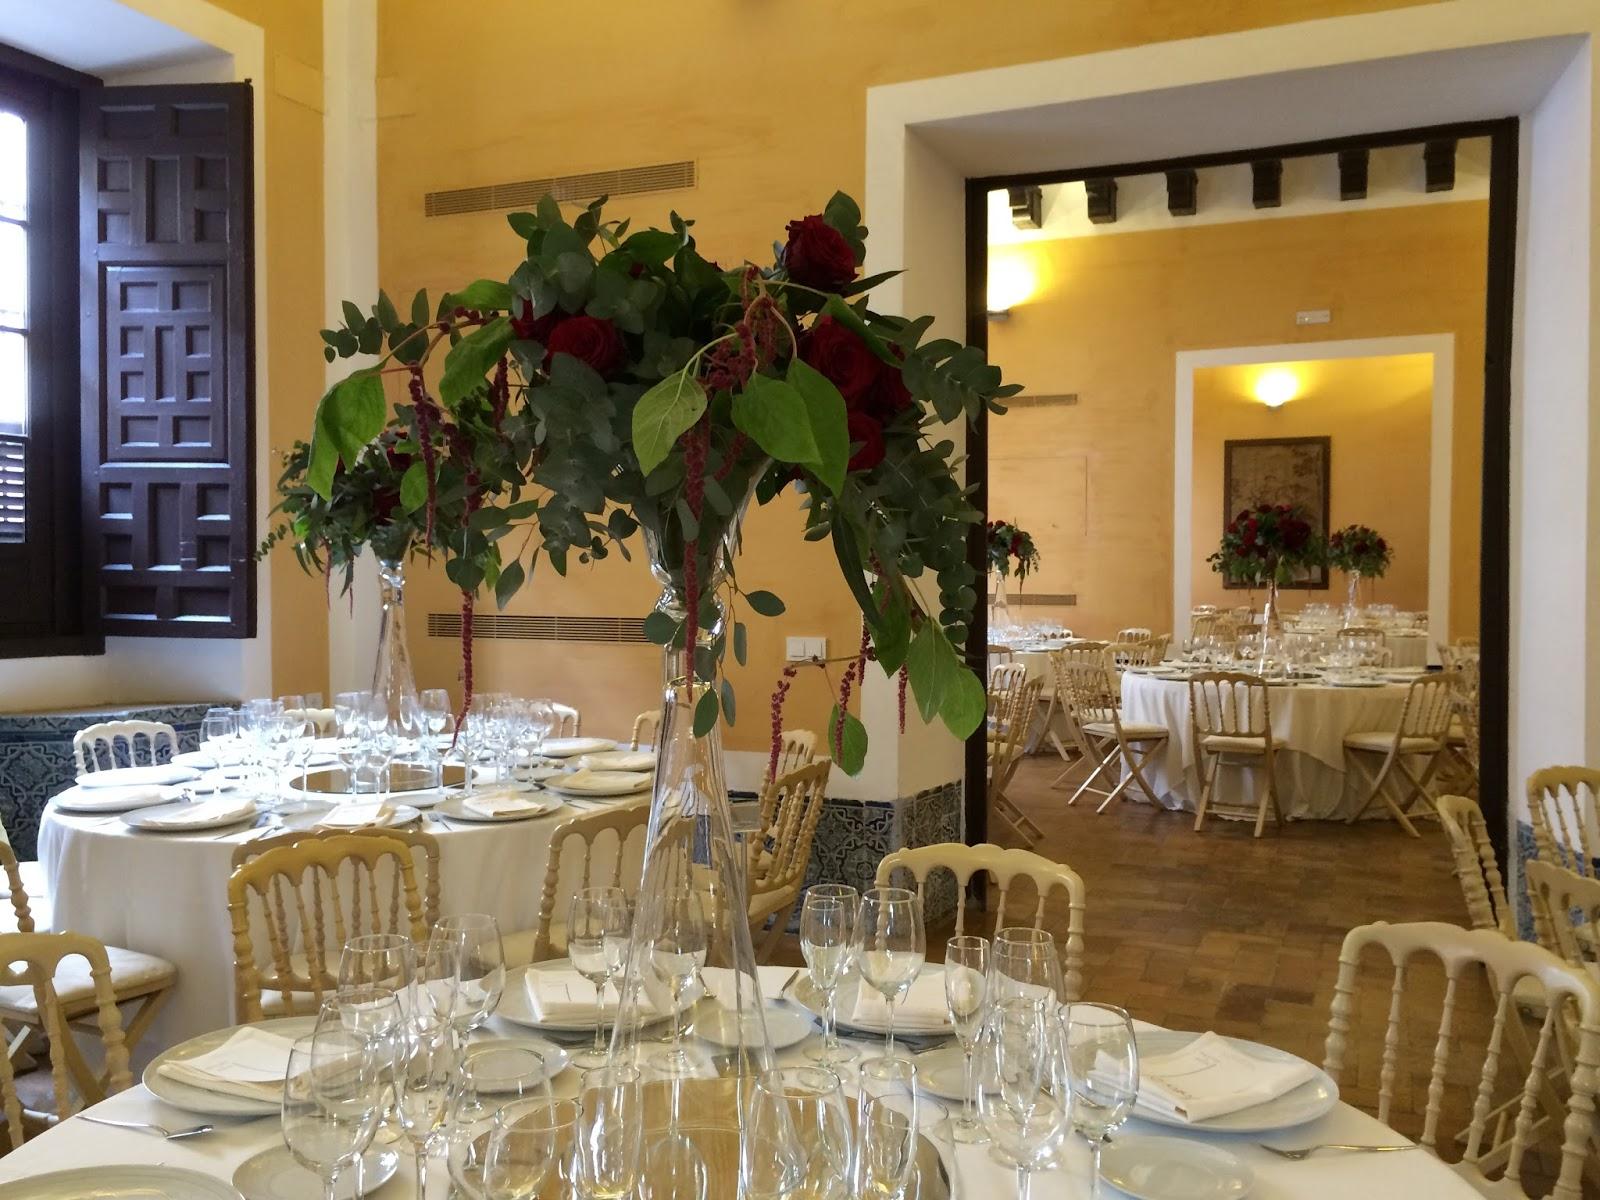 Boda elegante en casa bucarelli c rtamo flores for Decoracion casa novia